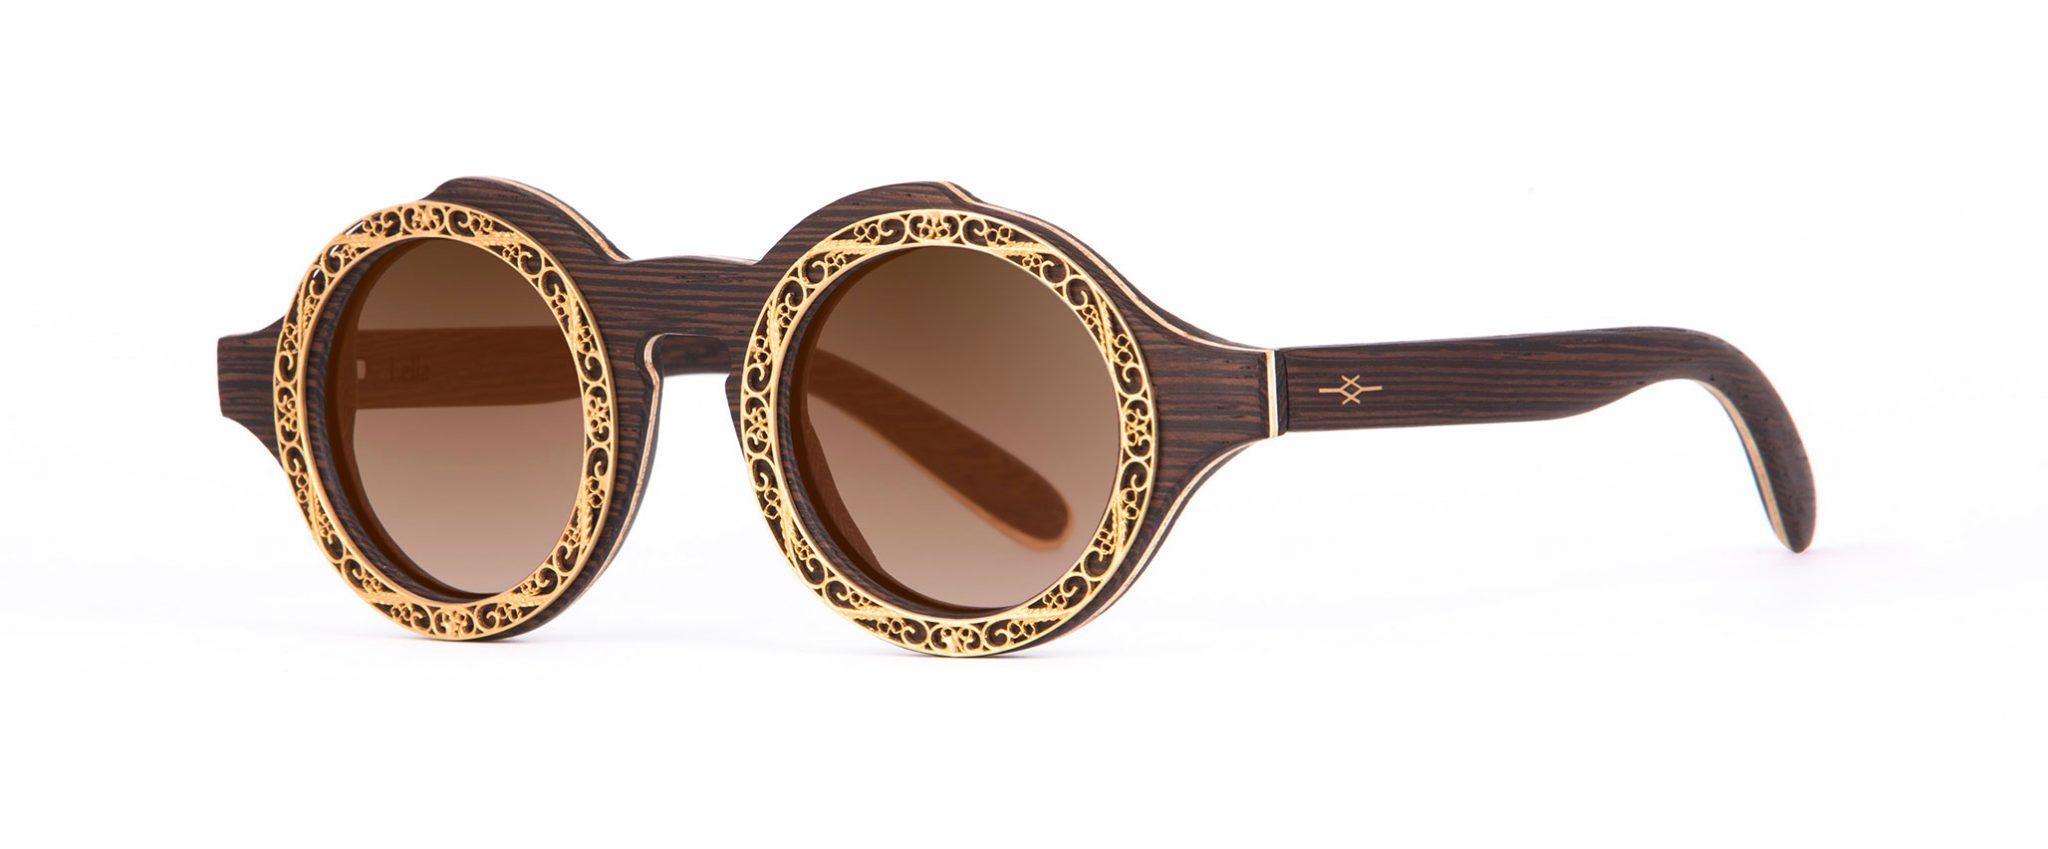 https://vakayeyewear.com/wp-content/uploads/2017/03/lella-jewelry-sunglasses-designer-eyewear.jpg